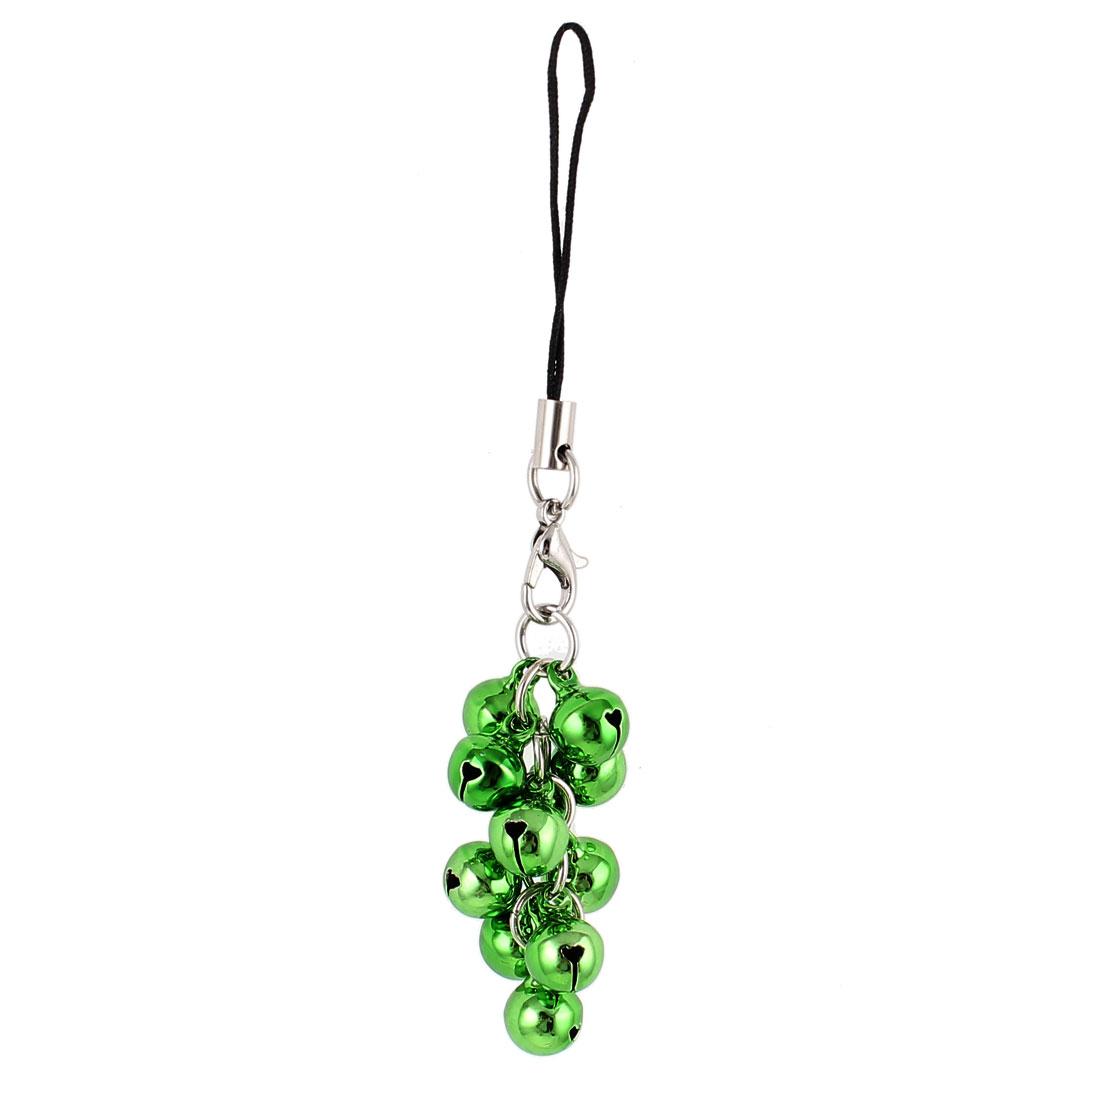 Cell Phone Bell Pendant Nylon Charm Strap Ornament 10cm Length Green